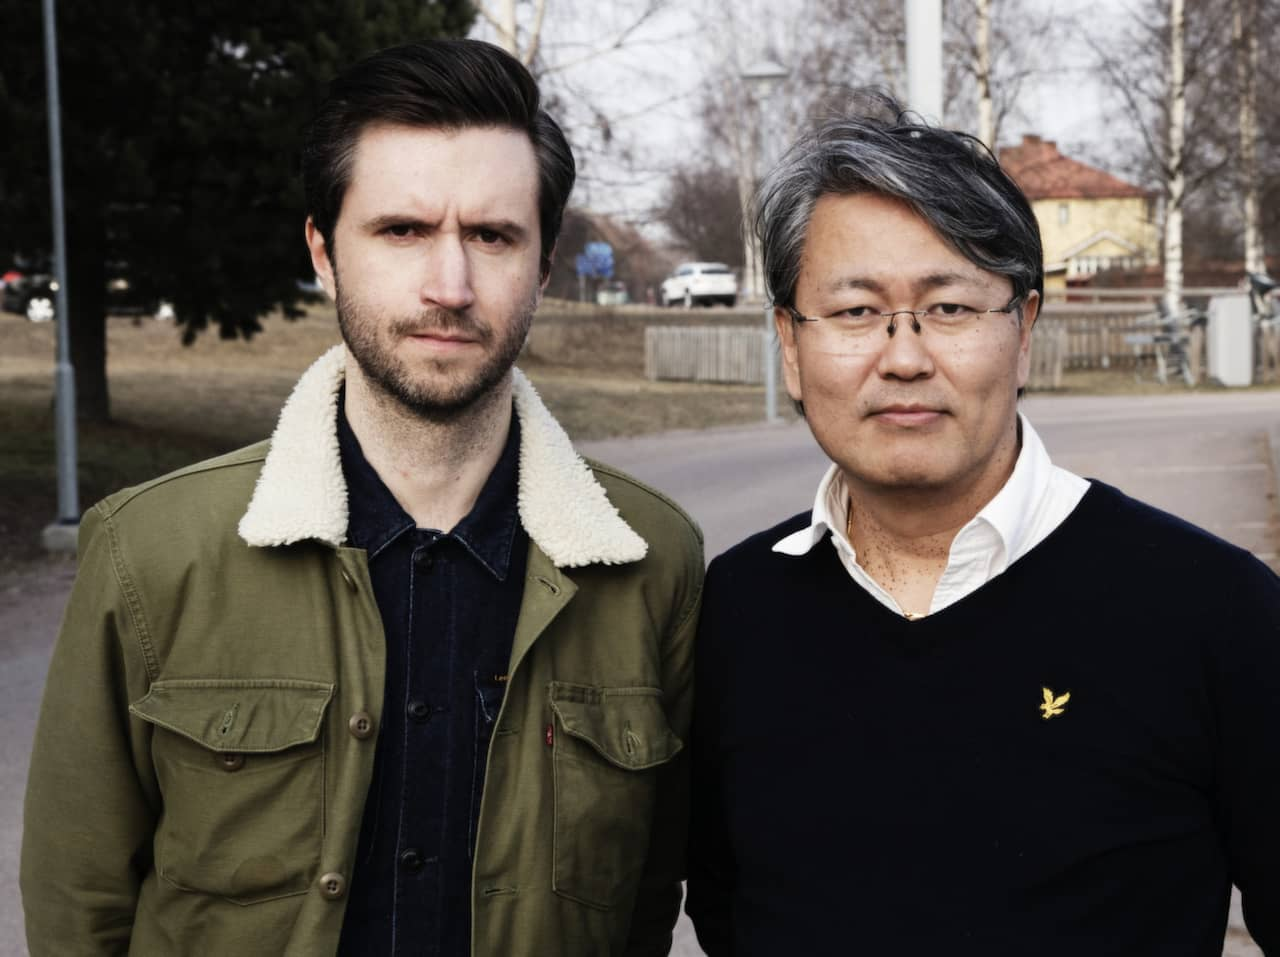 Linus Brännström & Olle Sporrong